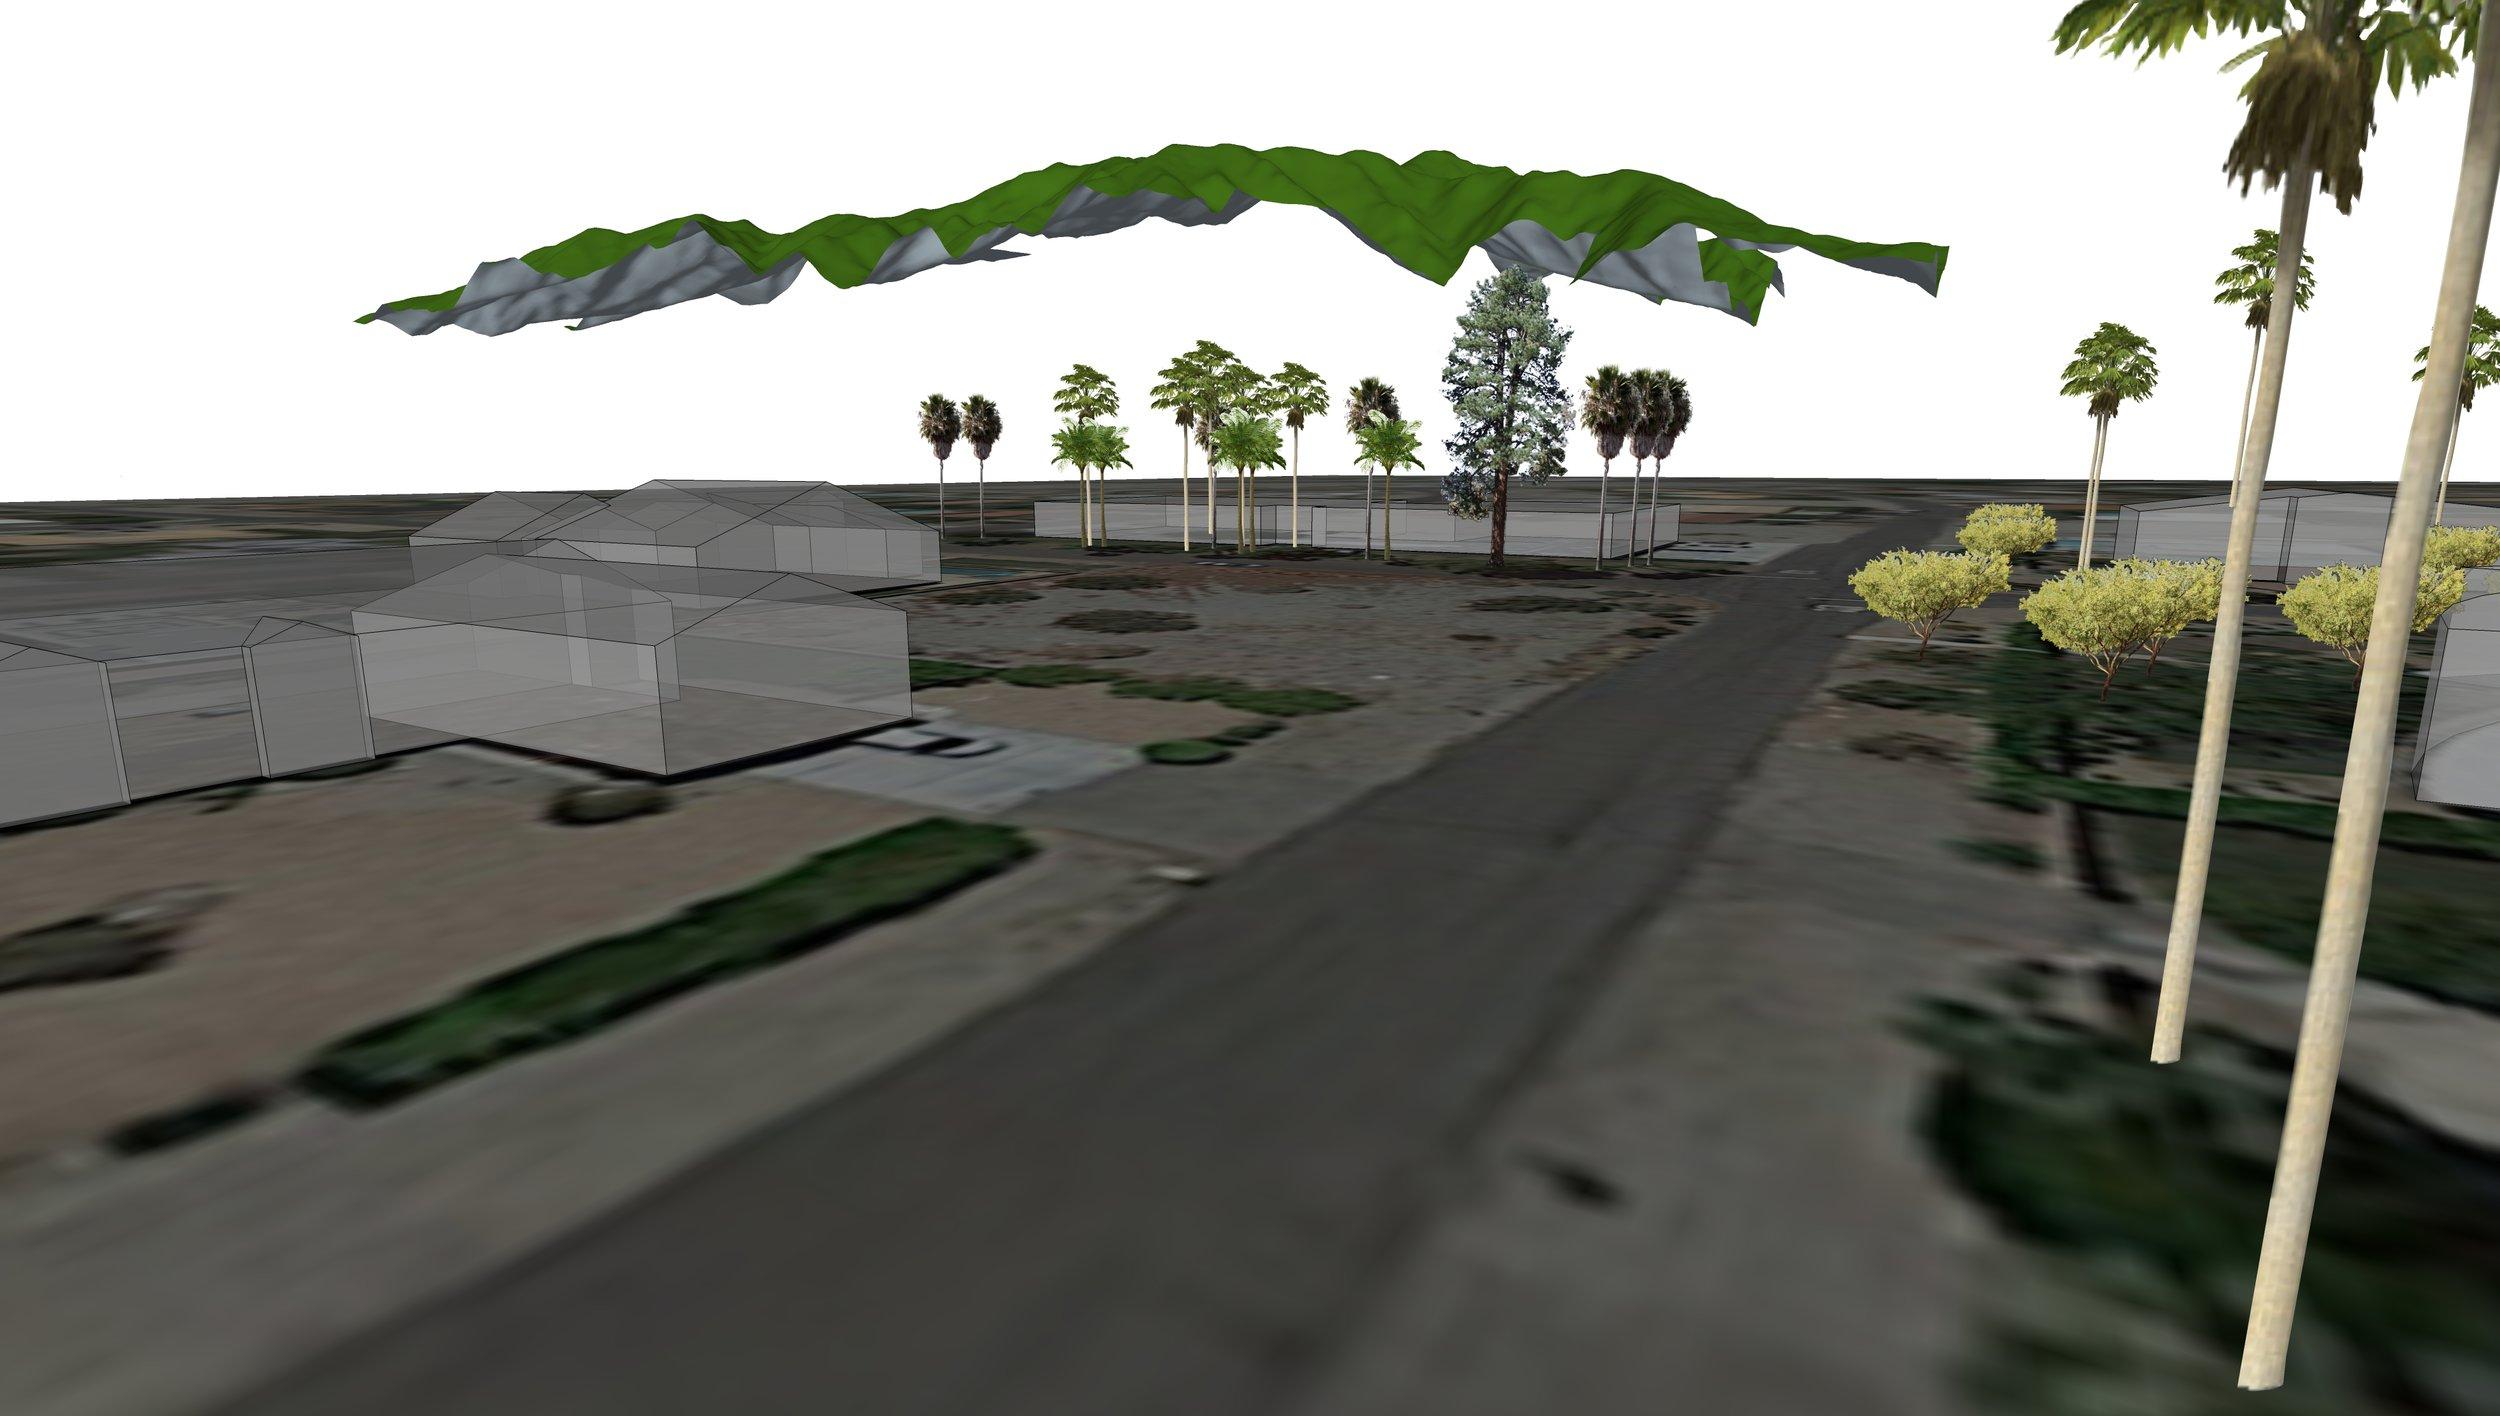 turkel_design_modern_prefab_home_axiomdeserthouse_site_model_landforms_views.jpg